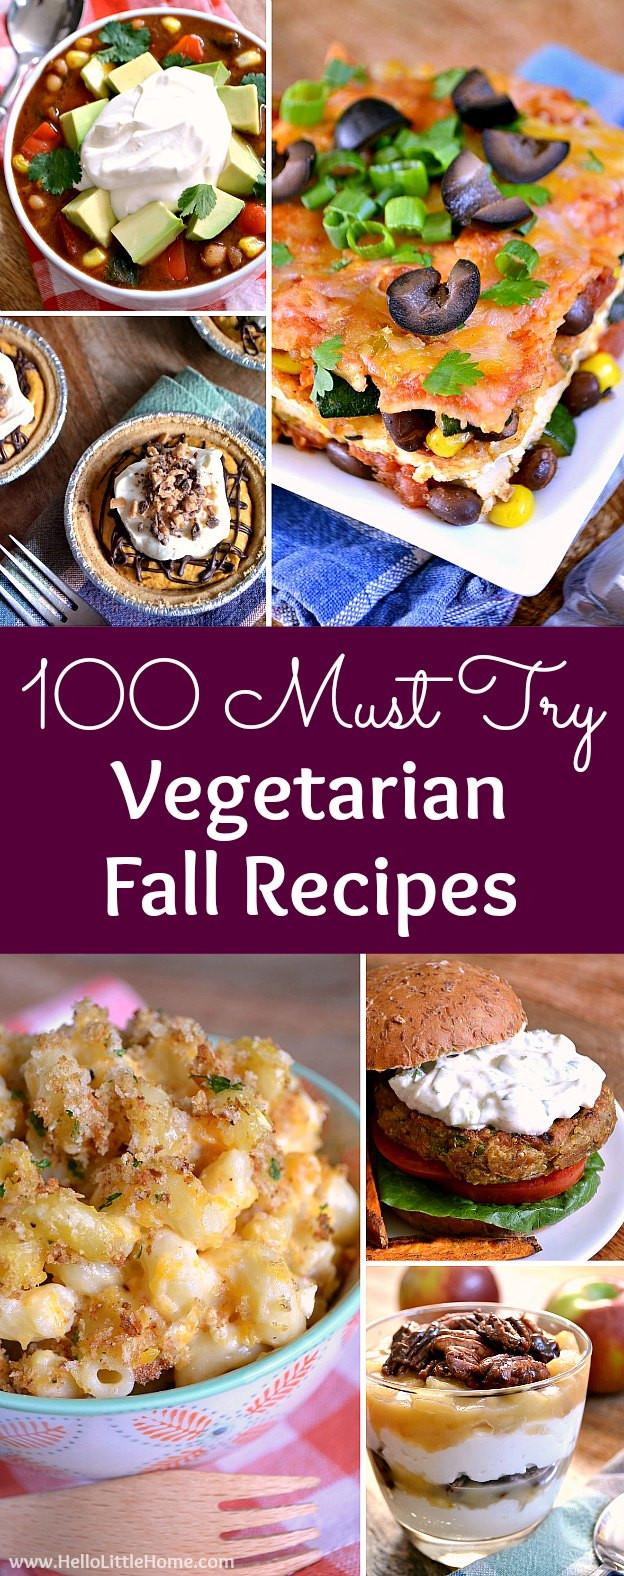 Fall Vegetarian Recipes  100 Must Try Ve arian Fall Recipes